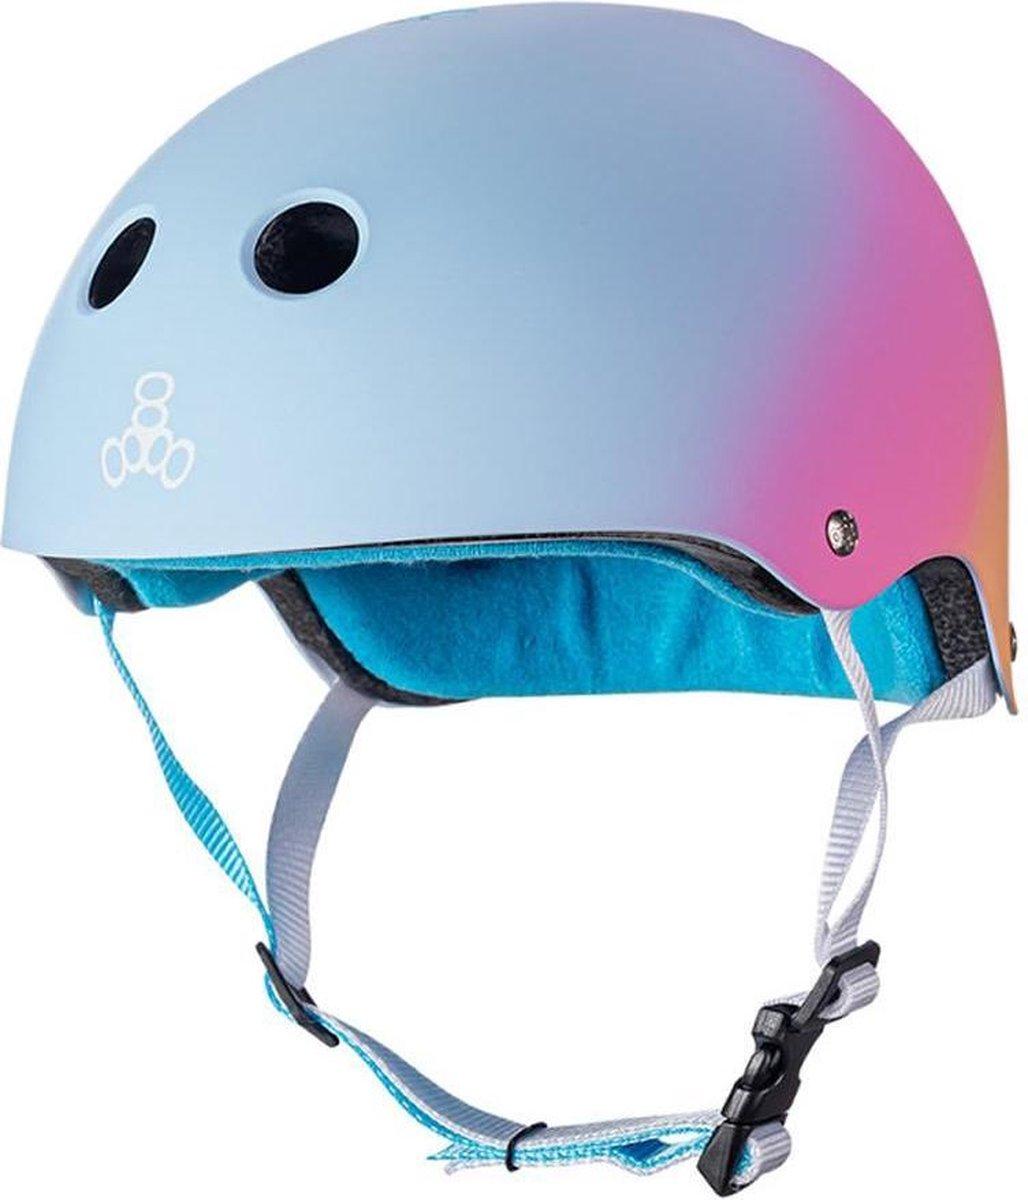 The Certified Sweatsaver Helmet Sunset S/M